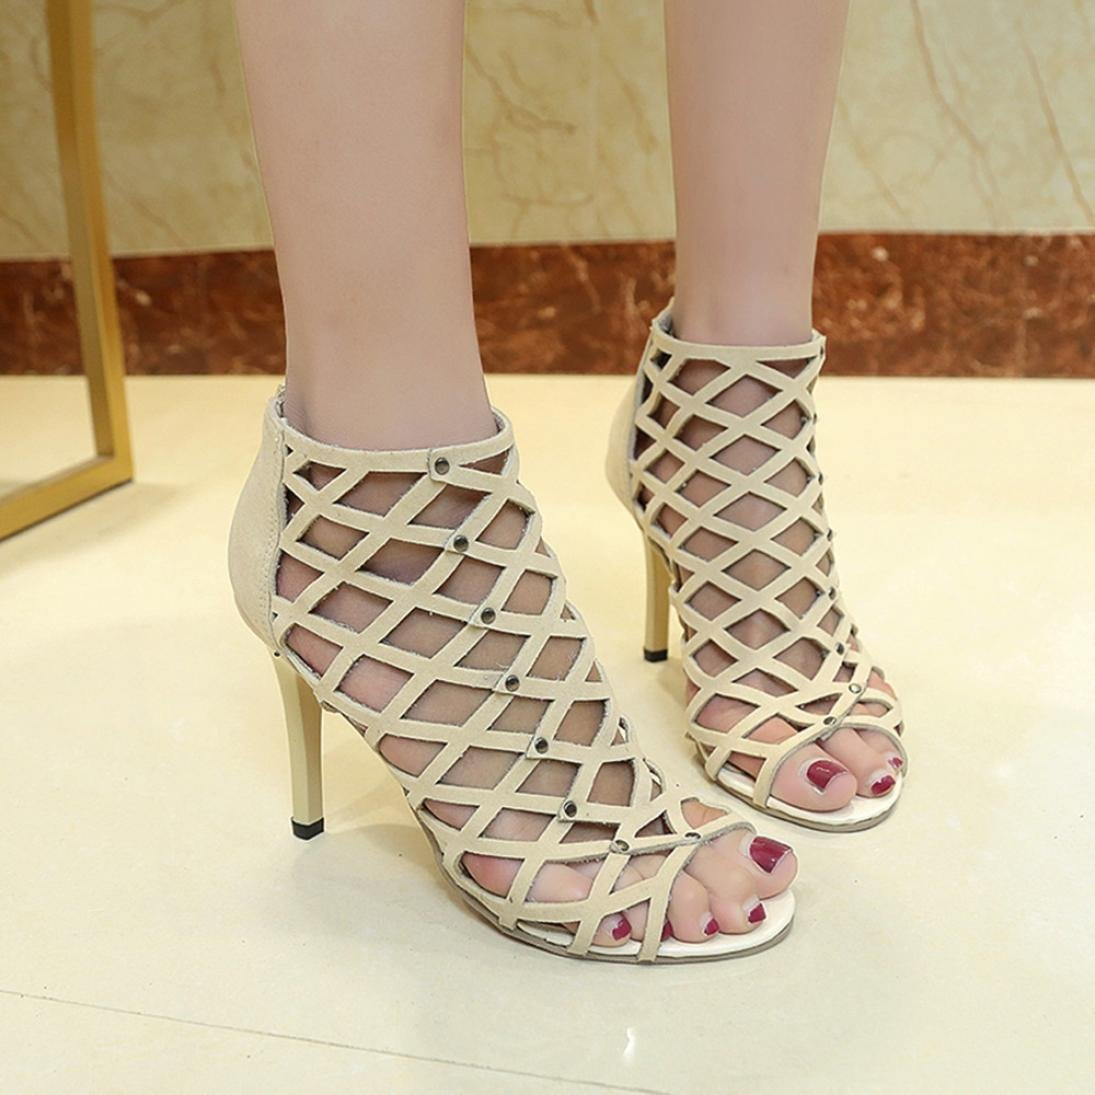 2d8670996 Clearance Sale!OverDose Women s Fashion Peep Toe High Heels Shoes Rivet  Roman Gladiator Sandals  Amazon.co.uk  Clothing